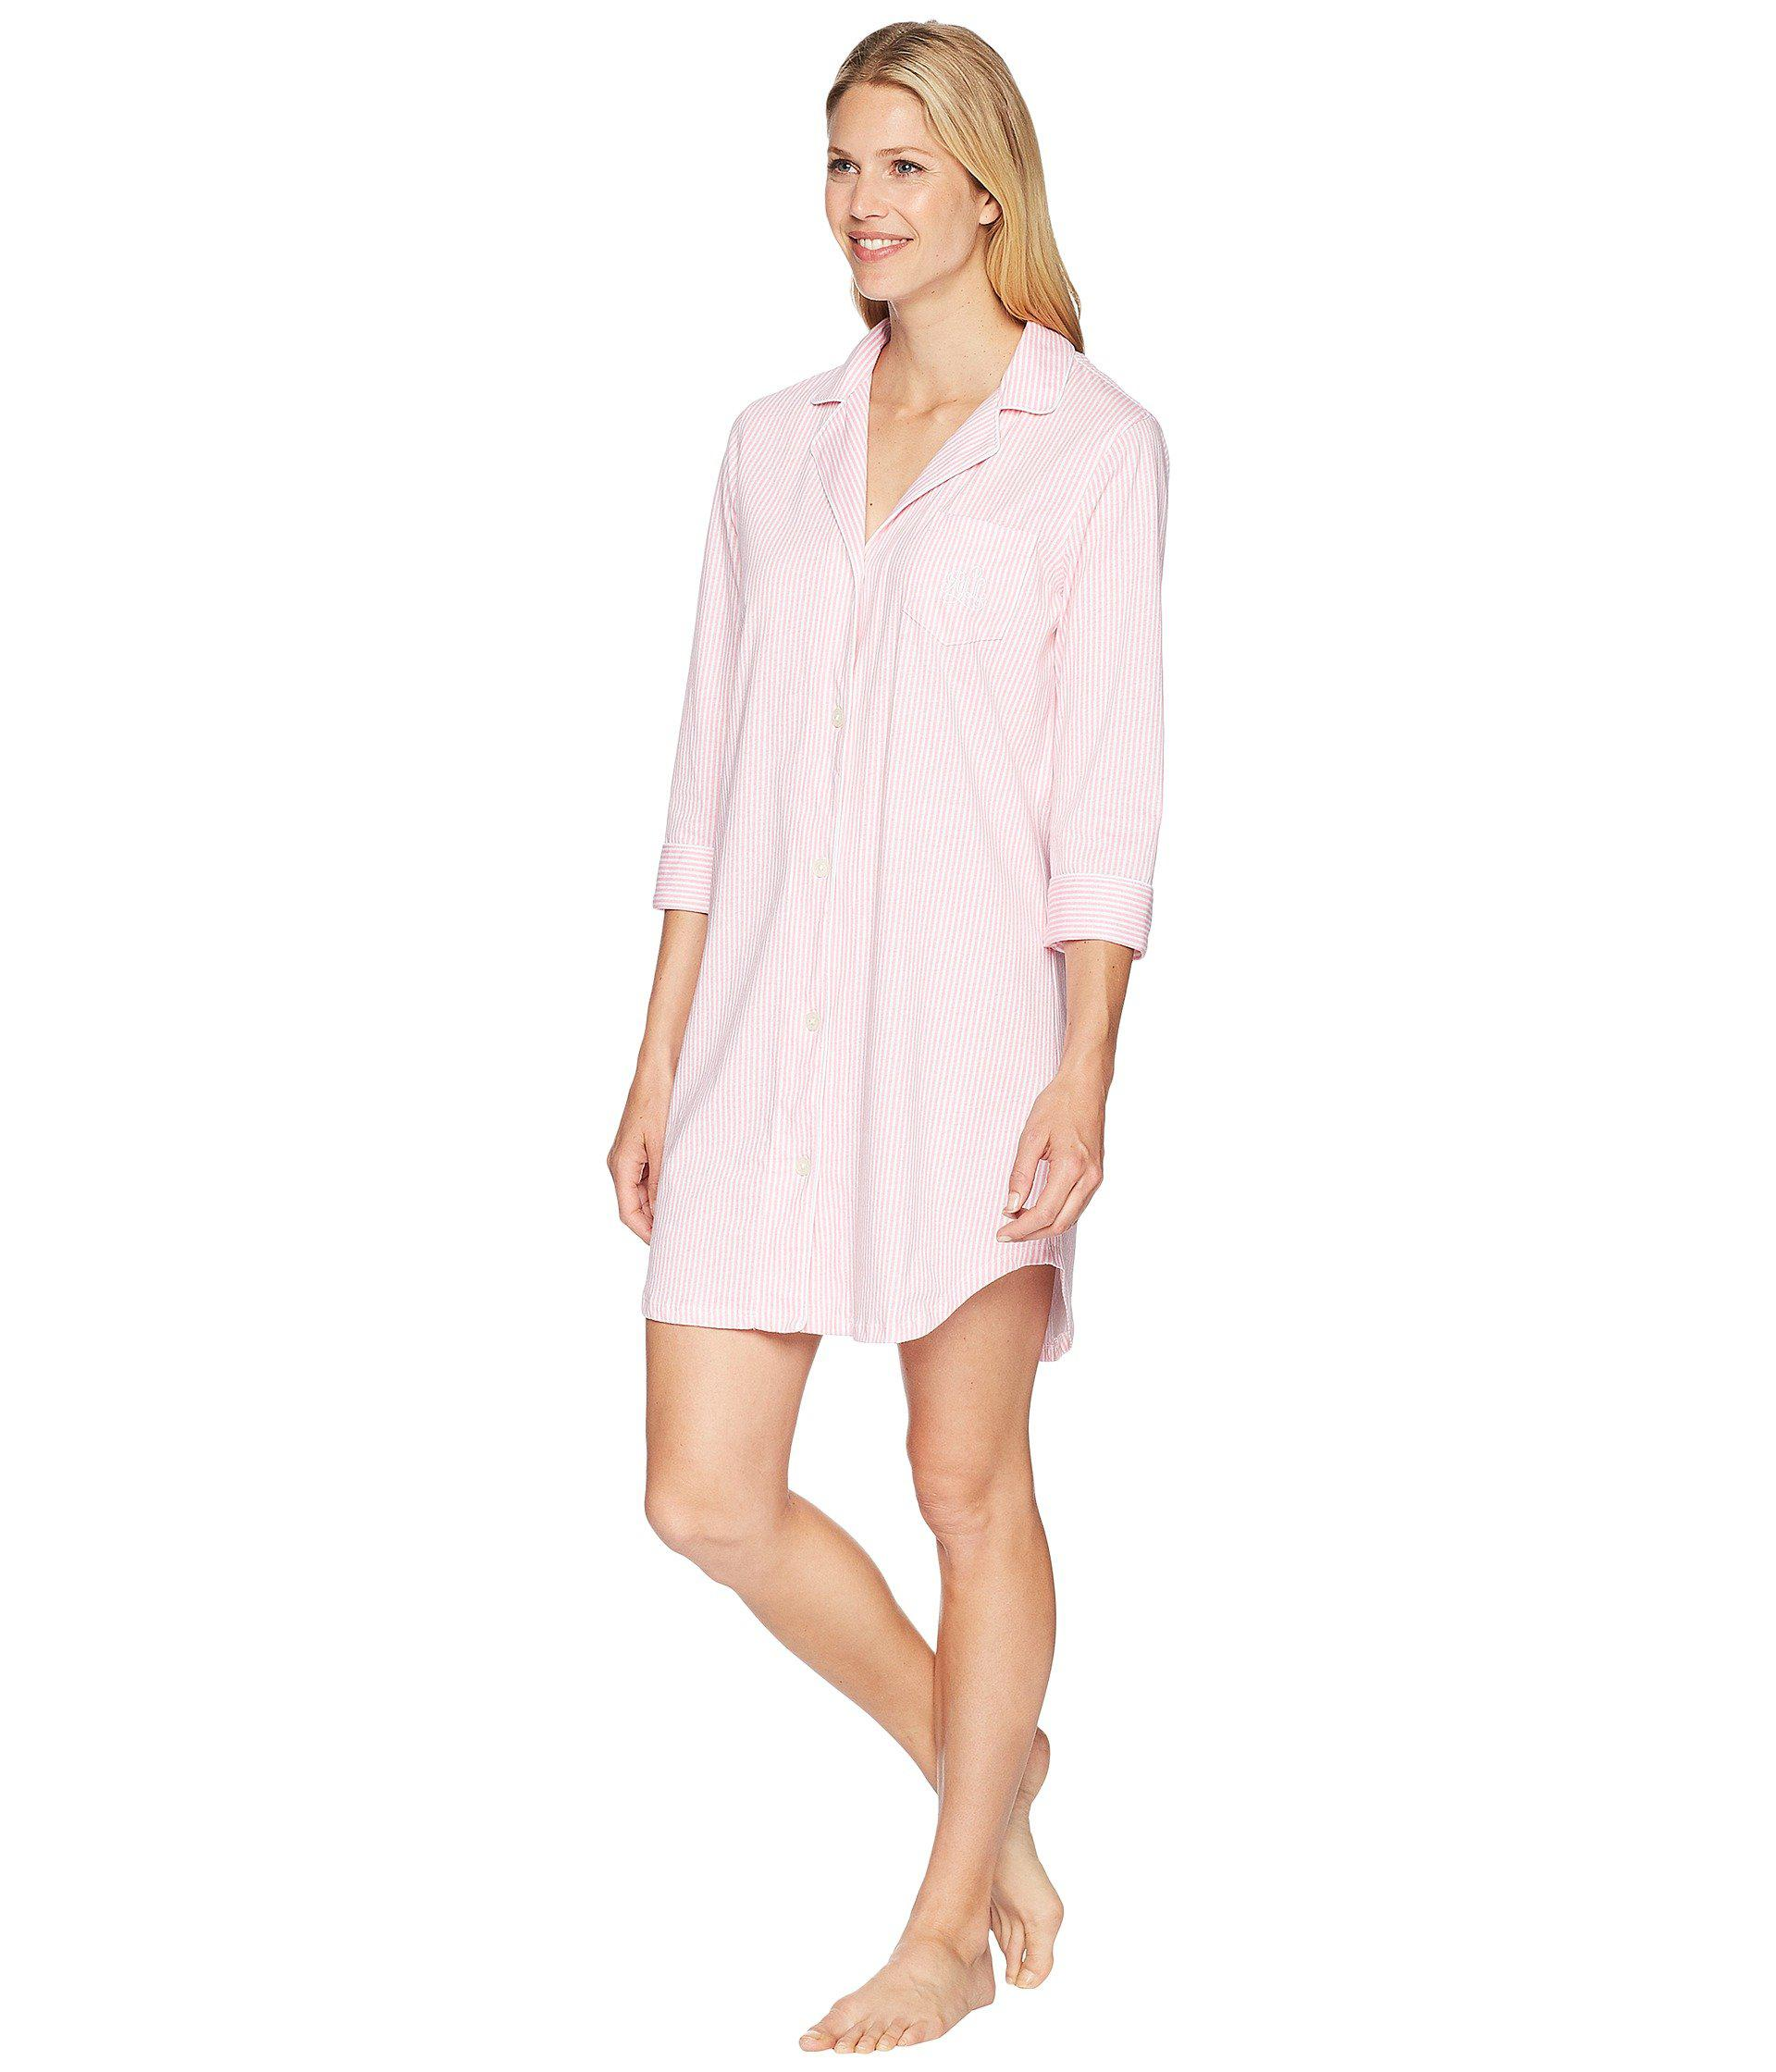 fa1b6b33ae0dd Lyst - Lauren by Ralph Lauren Essentials Bingham Knits Sleep Shirt (navy  Polka Dot) Women s Pajama in Pink